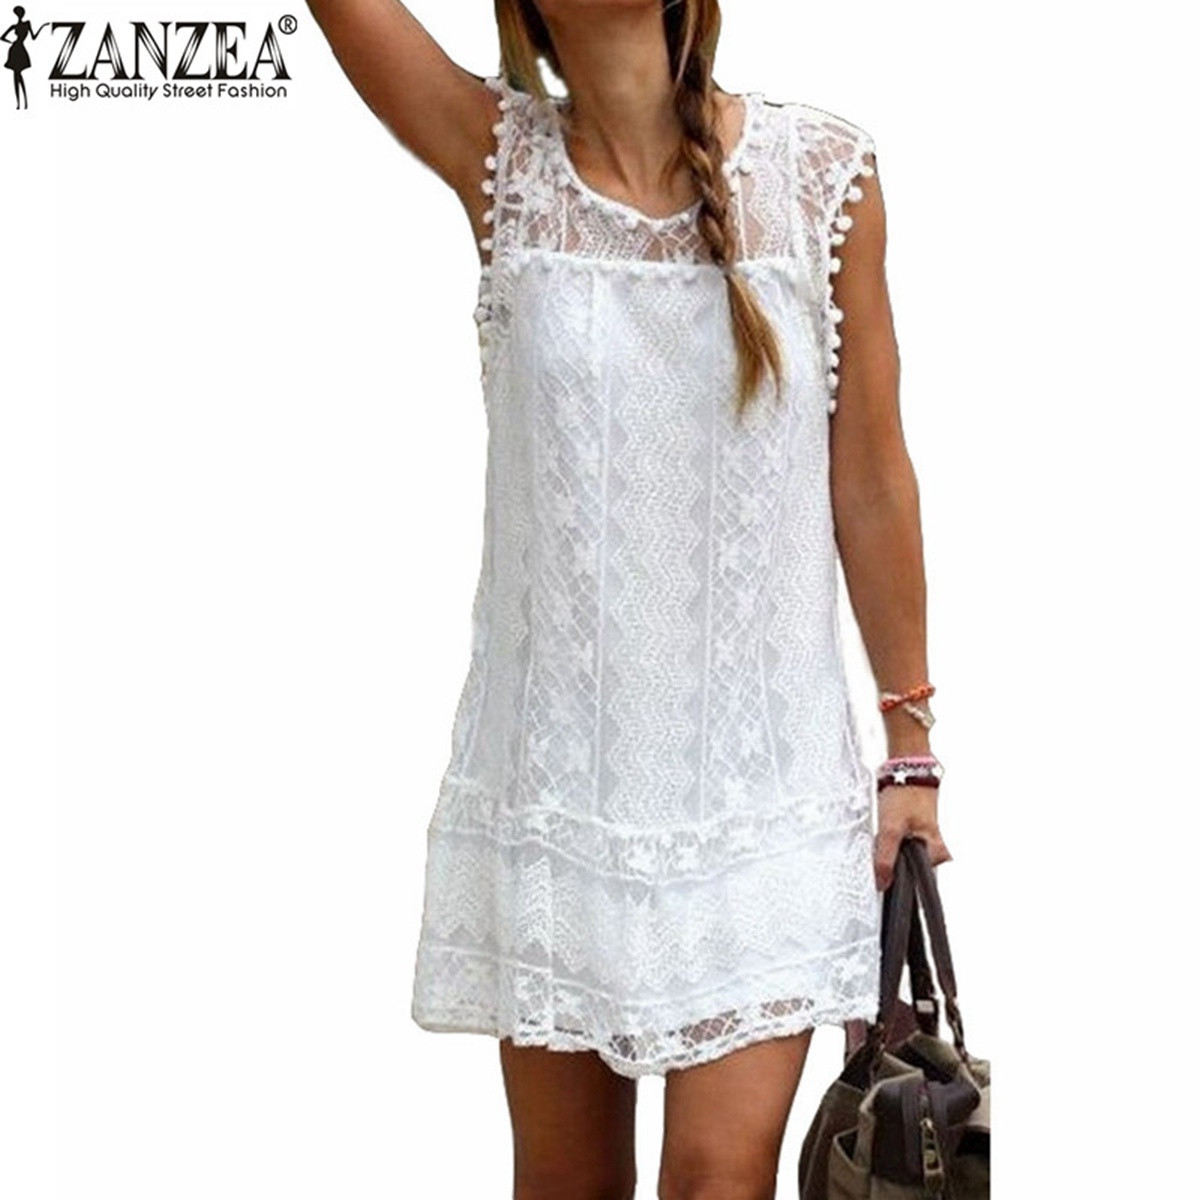 ZANZEA Vestidos 2018 Summer Elegant Women Casual Solid Short Sleeve Slim Lace Mini Dress Tops Ladies Sexy White Dress Plus Size